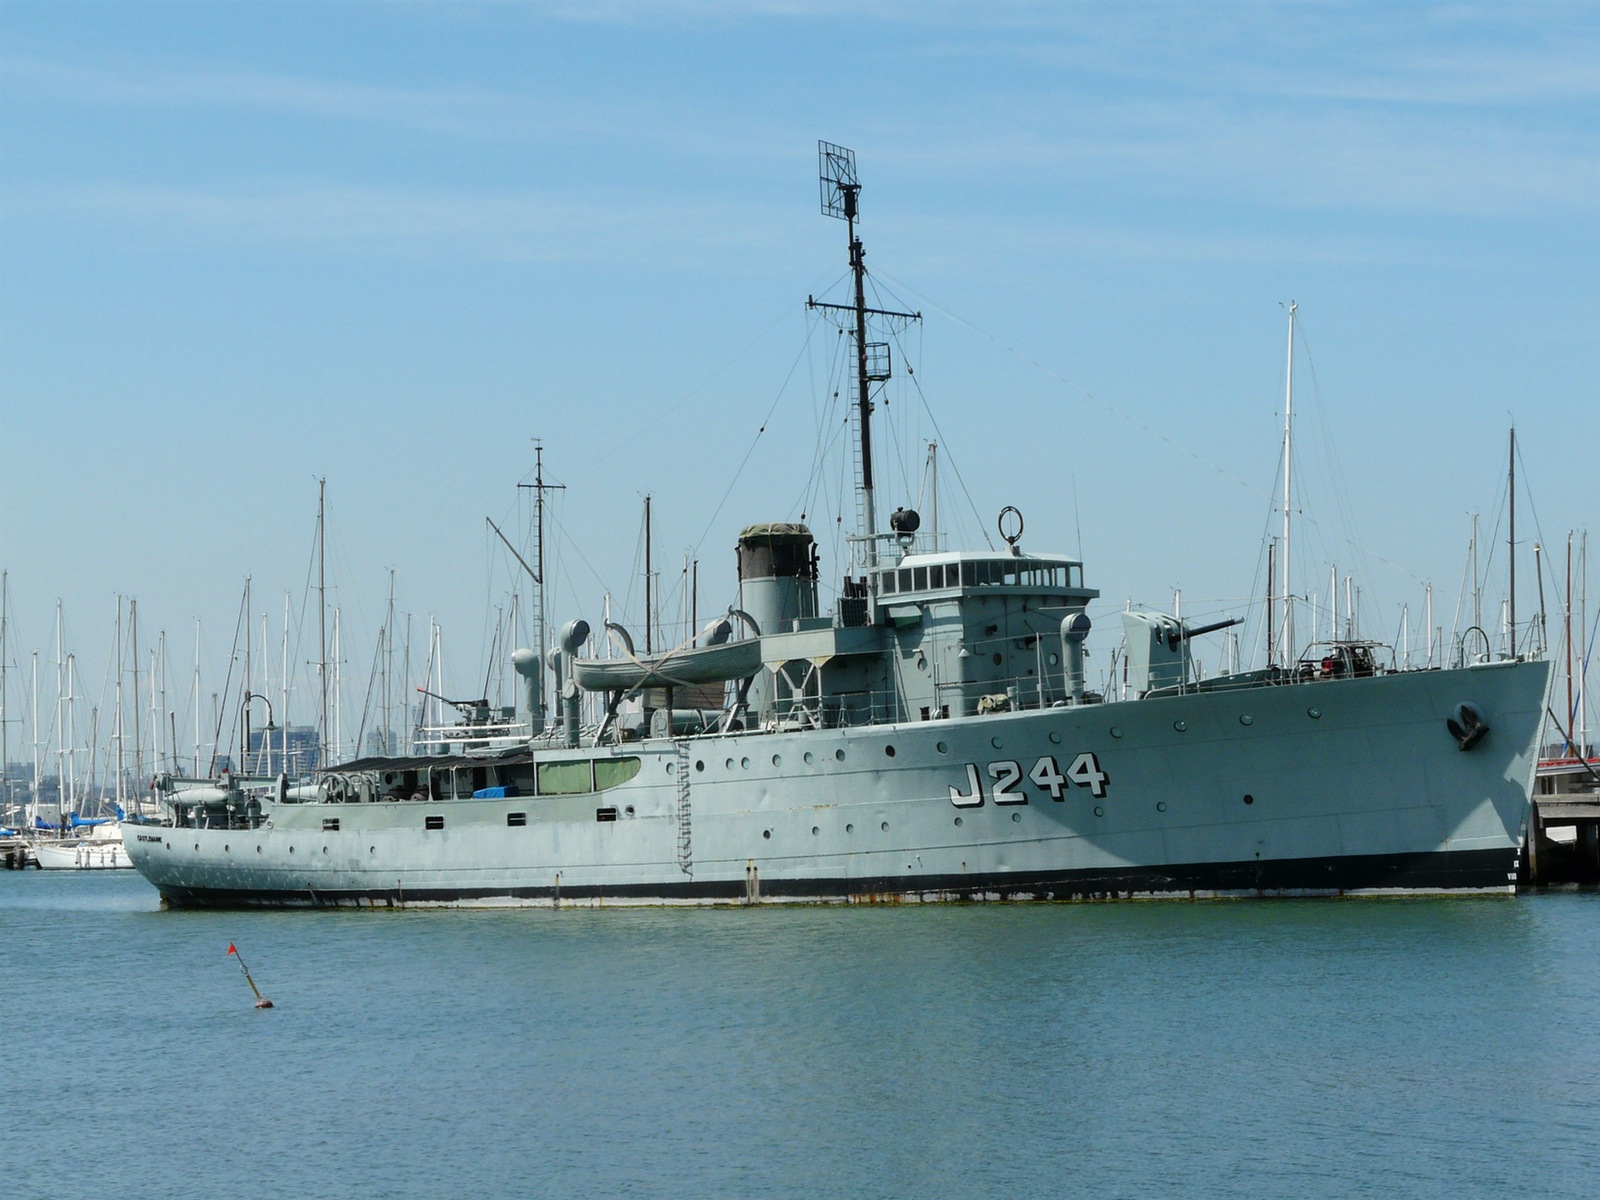 HMAS At Gem Pier, Williamstown